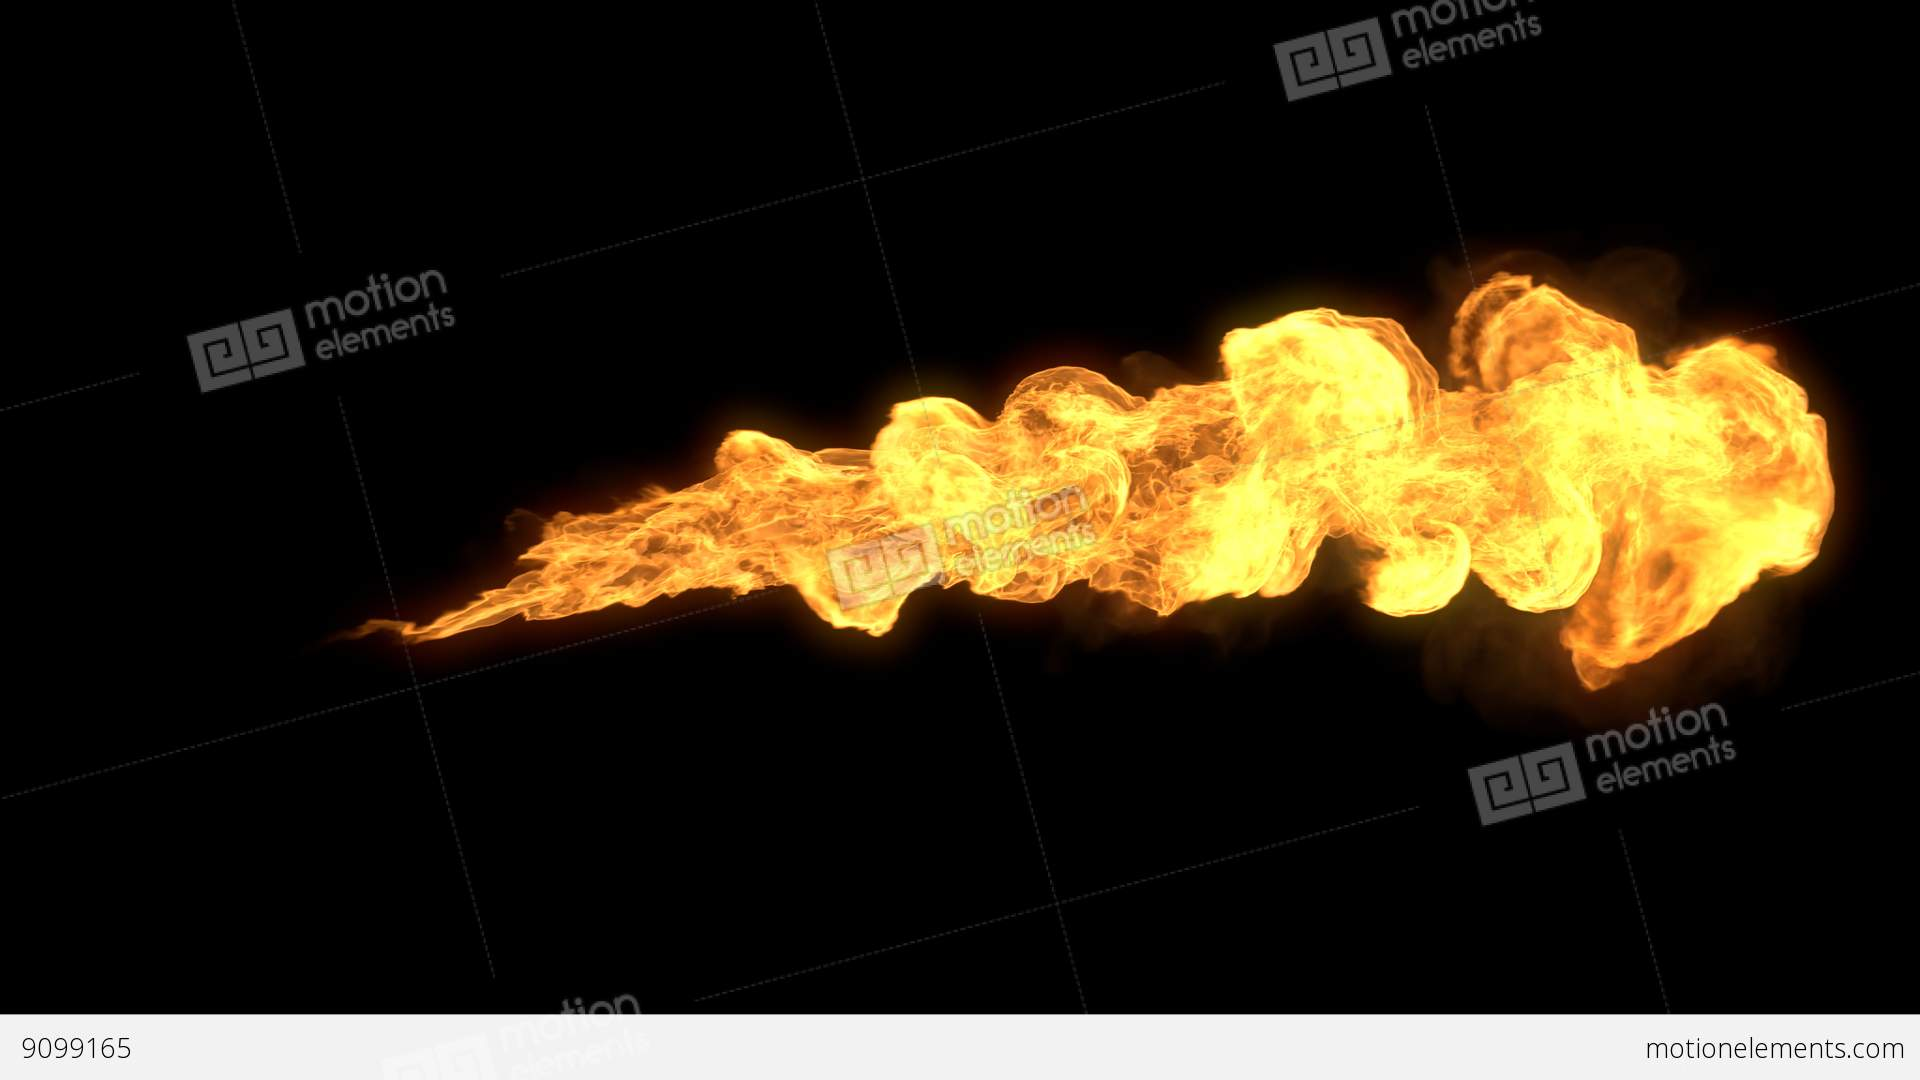 Realistic Stream Of Fire Like Fire-breathing Dragon's ...Fire Flames Dragon